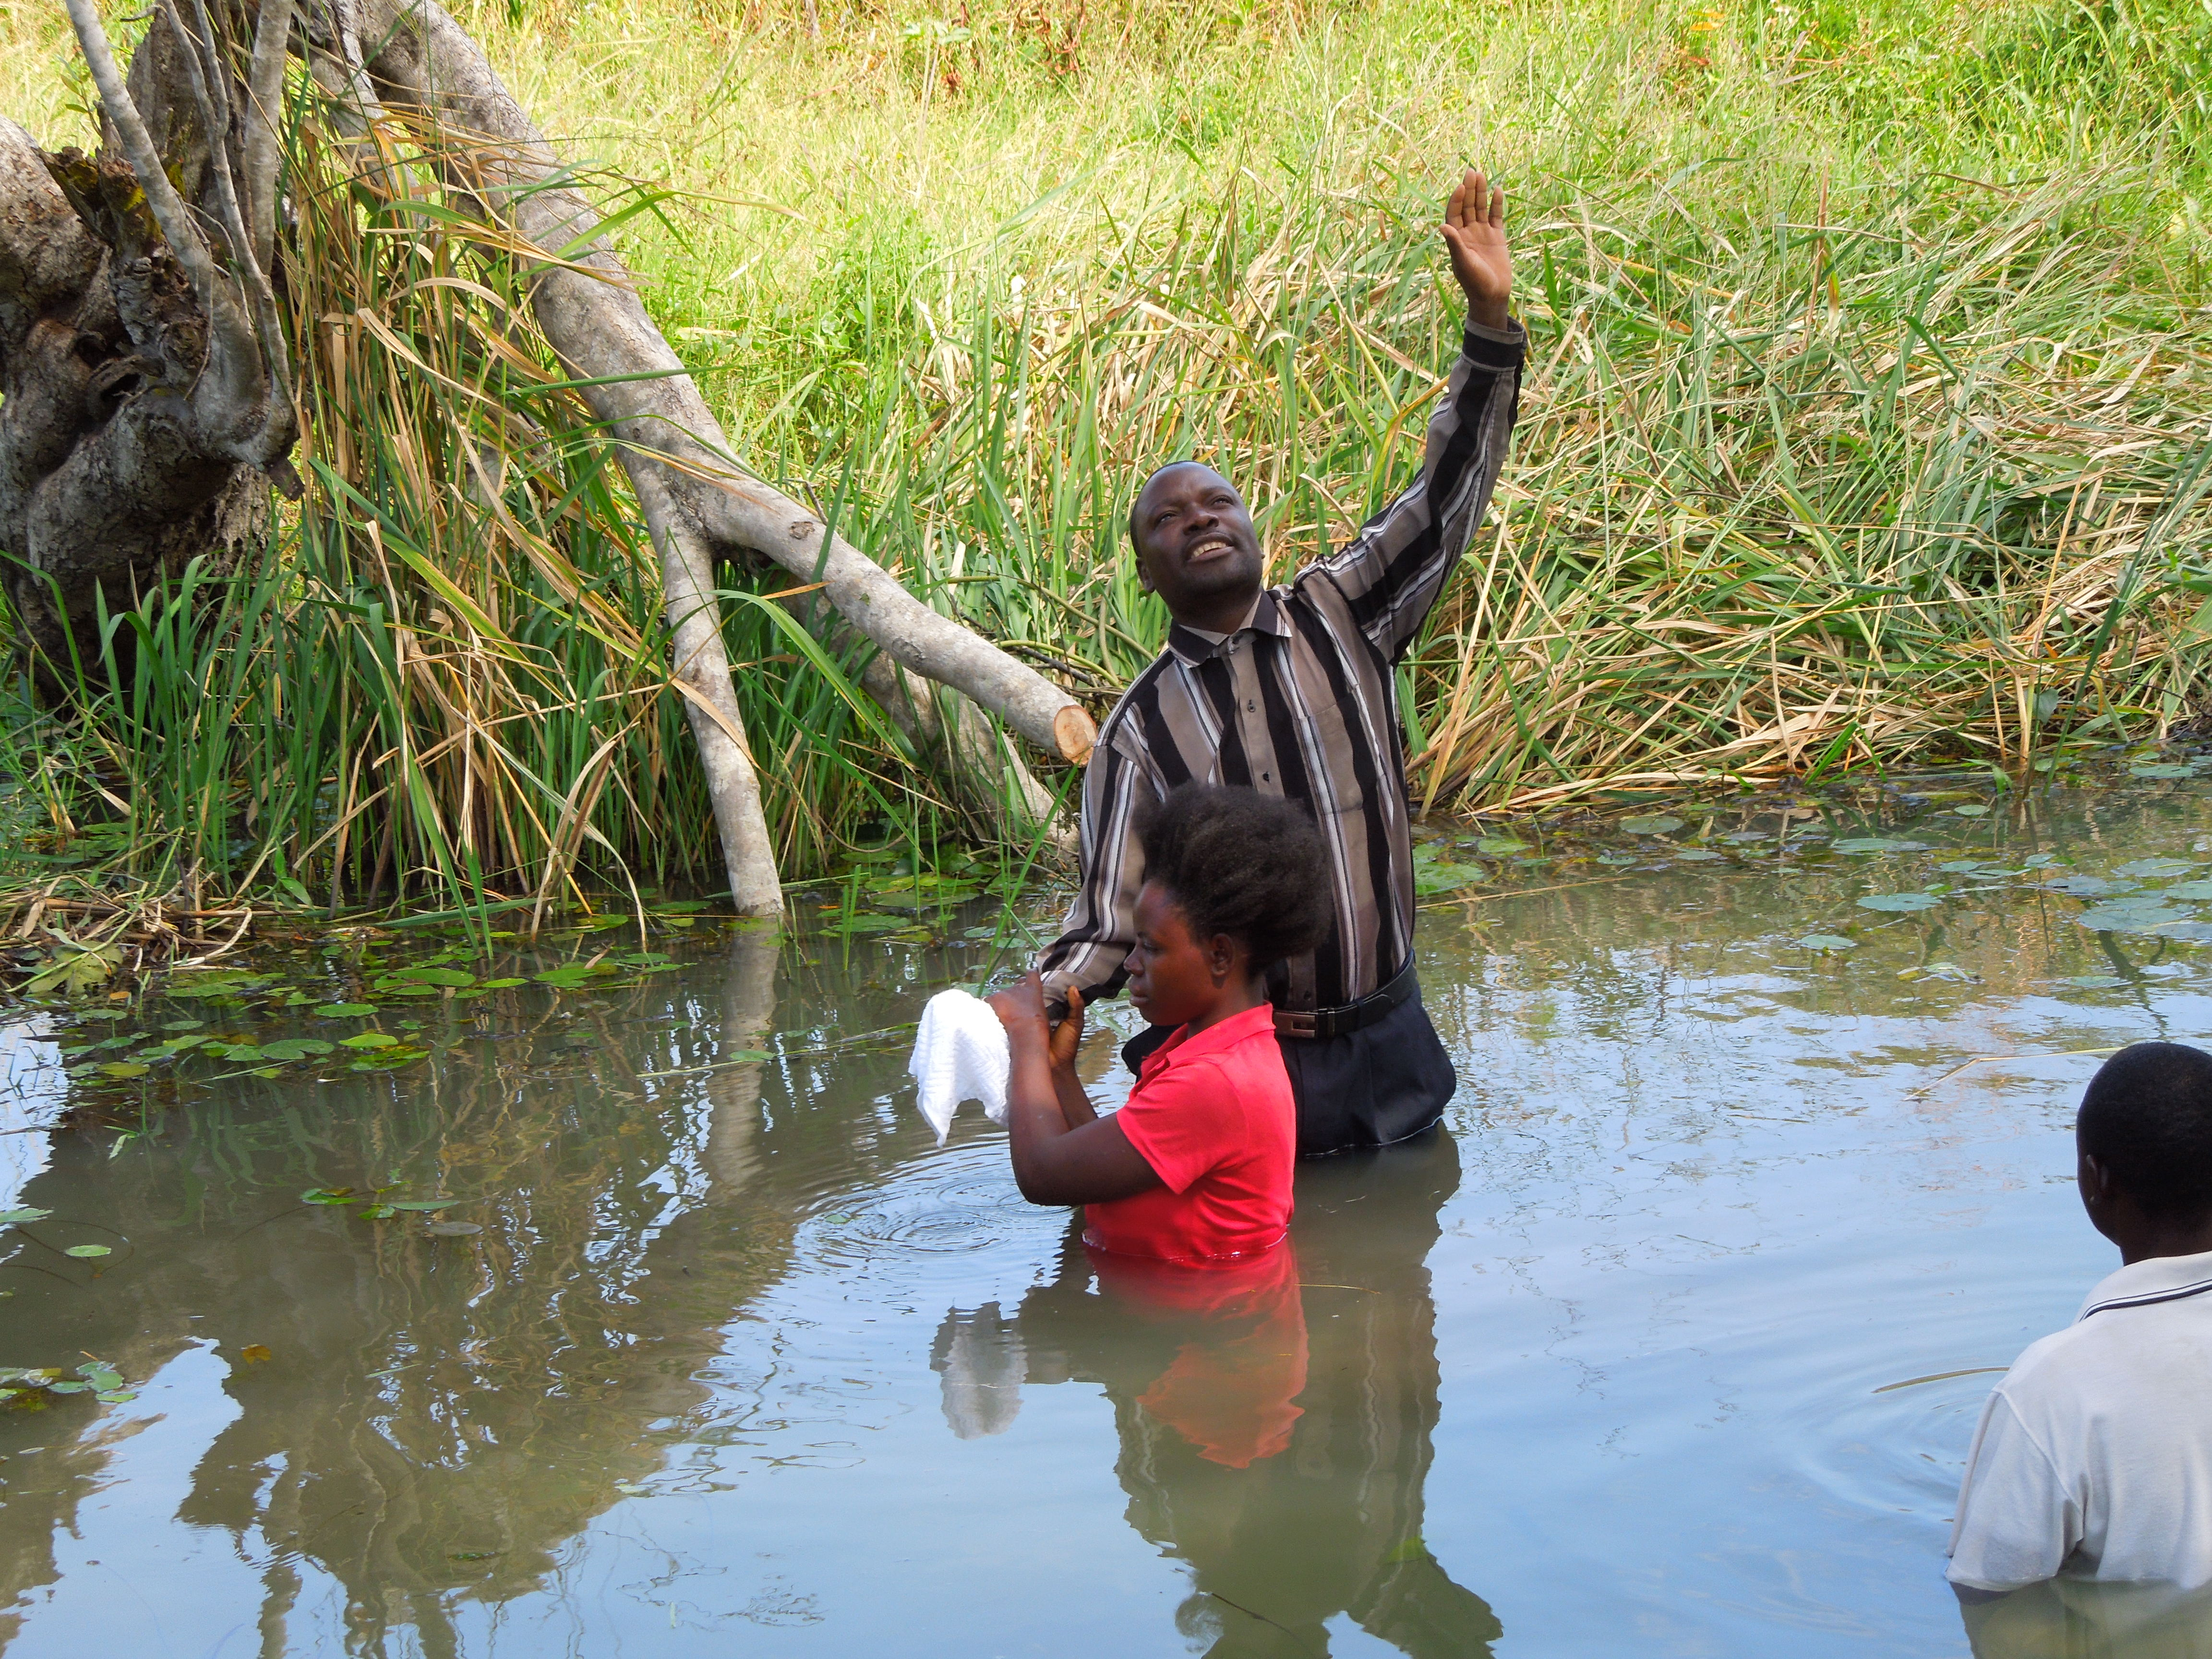 Iwell baptising